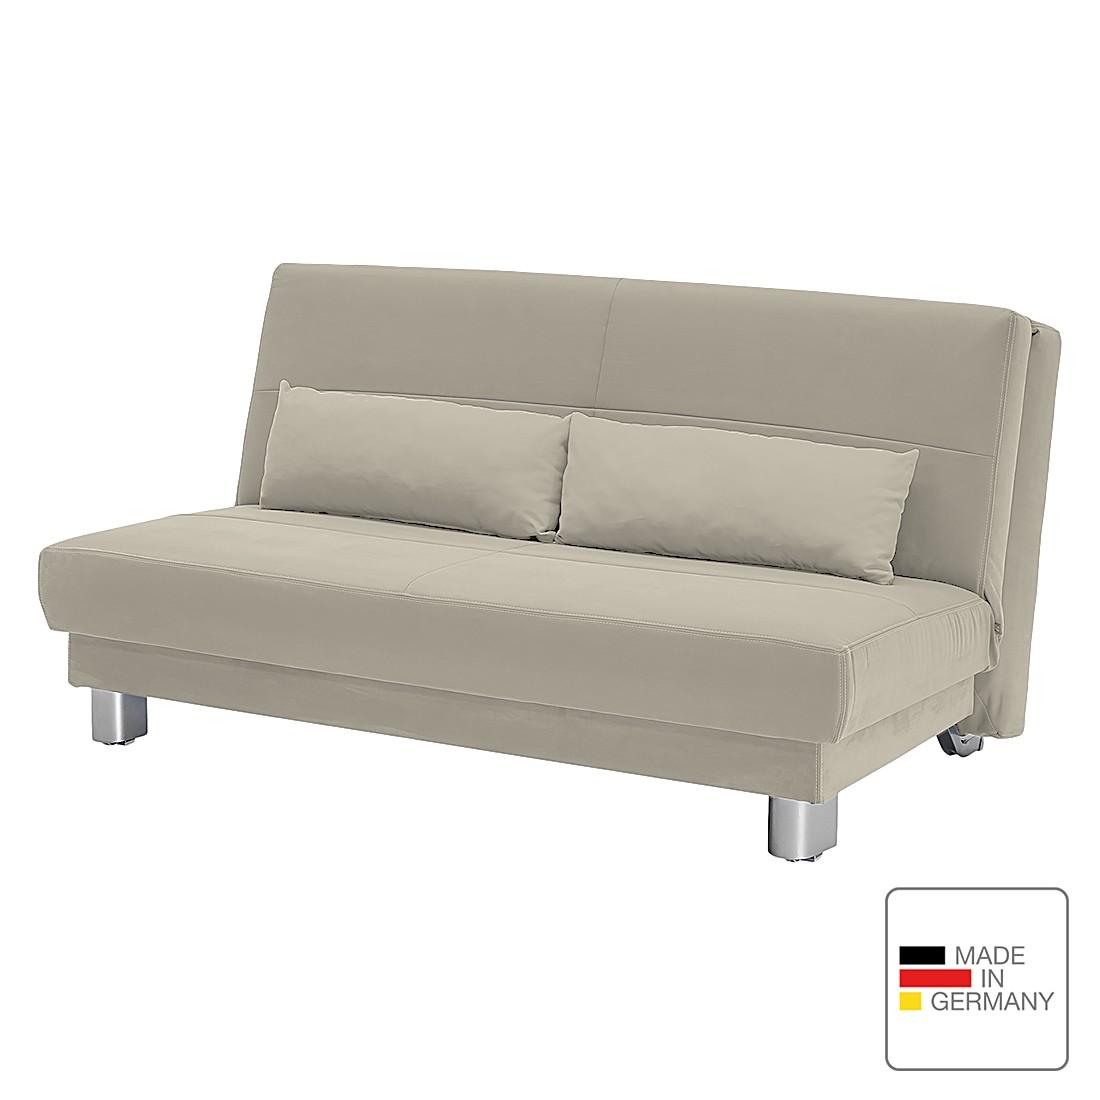 schlafsofa motard flachgewebe sand 158 cm studio monroe online bestellen. Black Bedroom Furniture Sets. Home Design Ideas